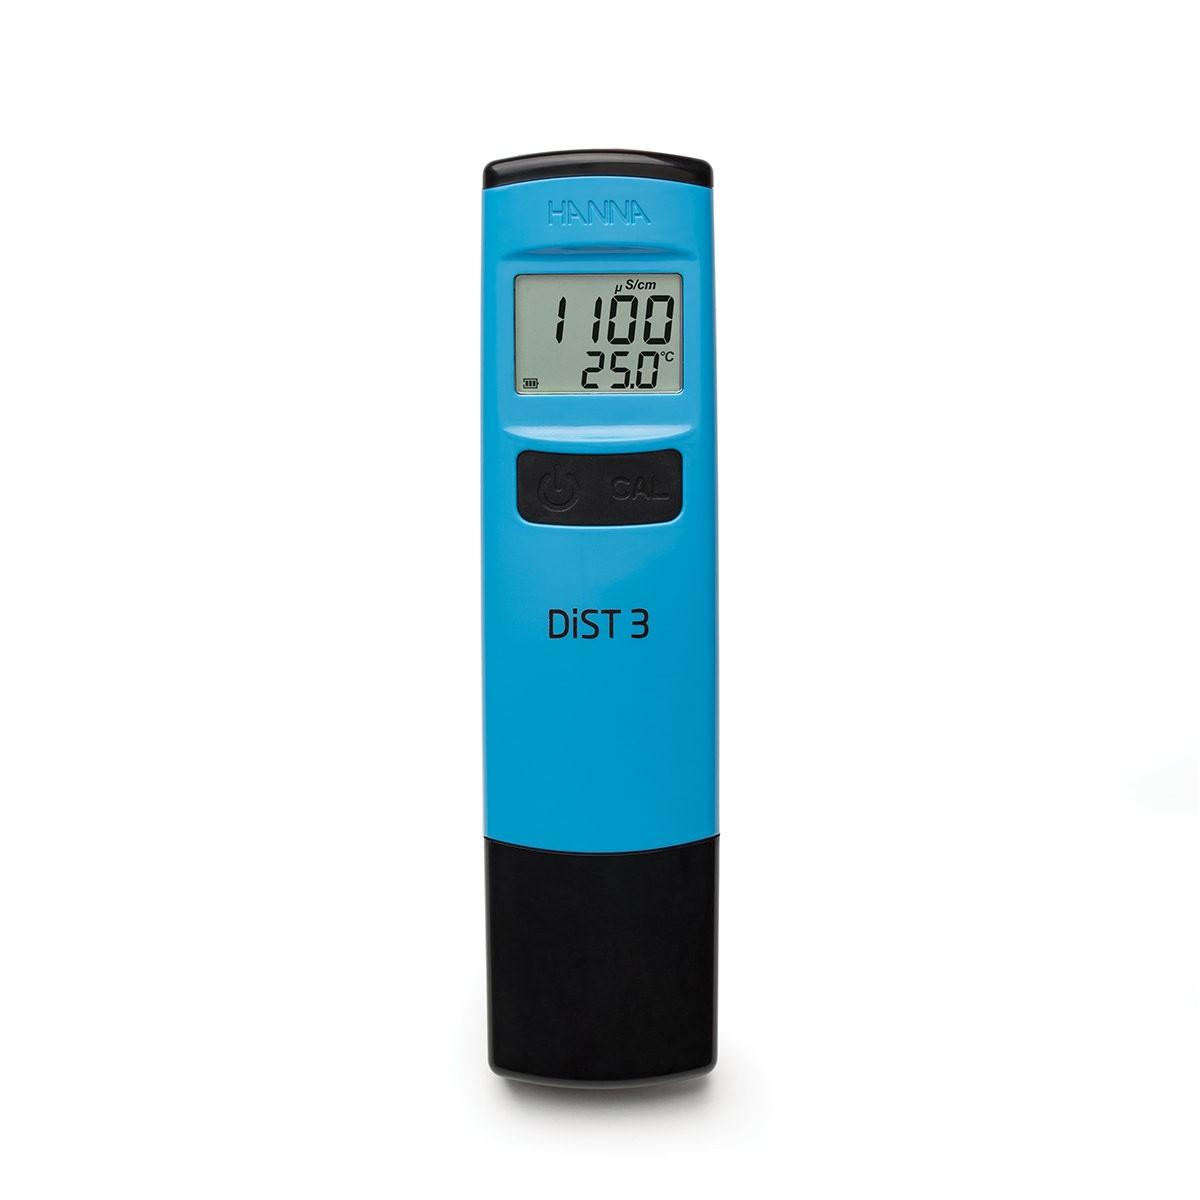 HI98303 - DiST® 3 (0-2000 µS / cm) EC Test Cihazı  Su Geçirmez